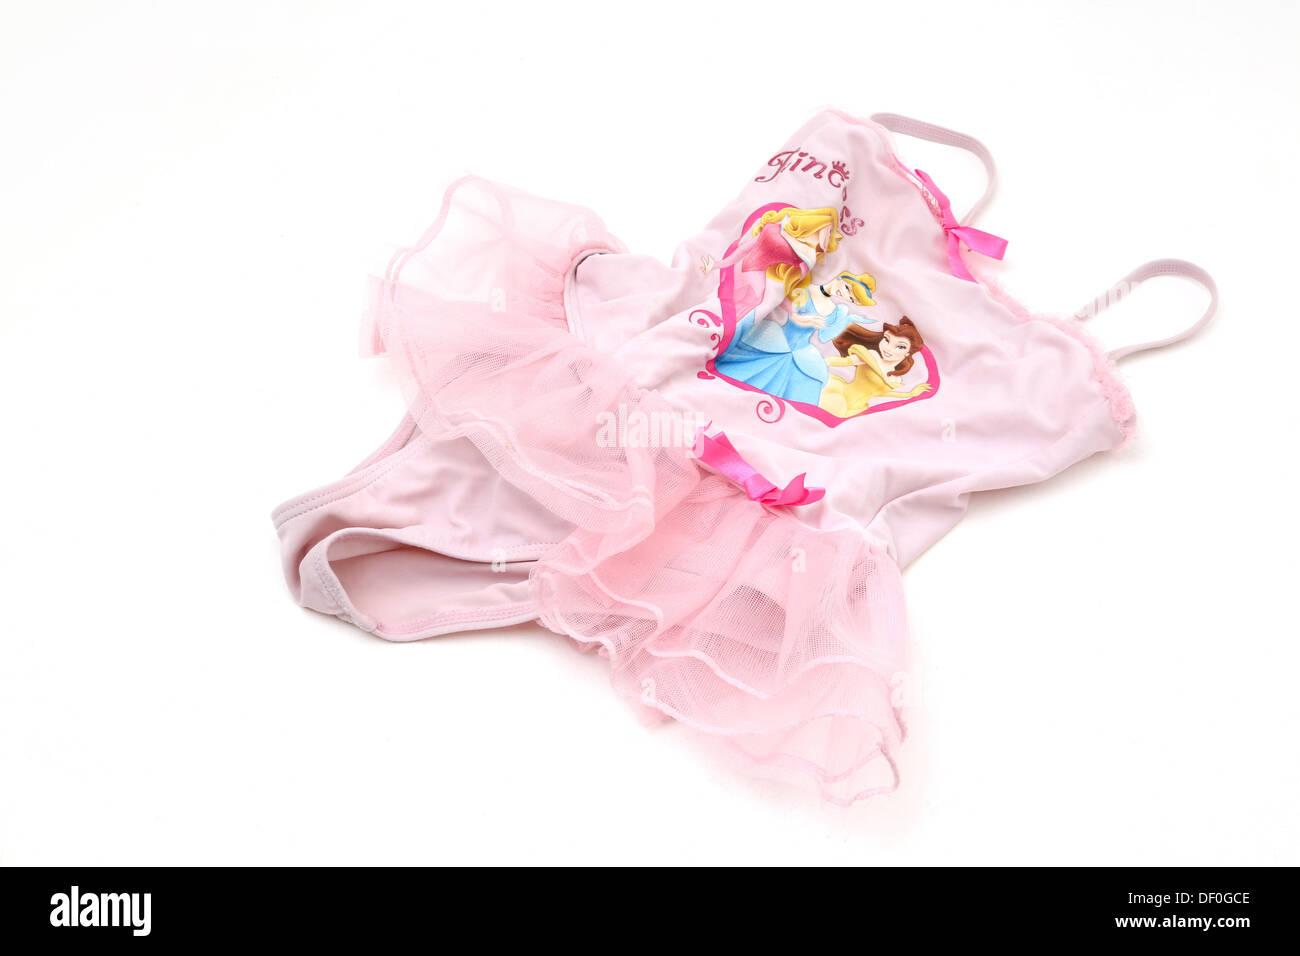 Girls Princess Swimming Costume  sc 1 st  Alamy & Girls Princess Swimming Costume Stock Photo: 60863838 - Alamy